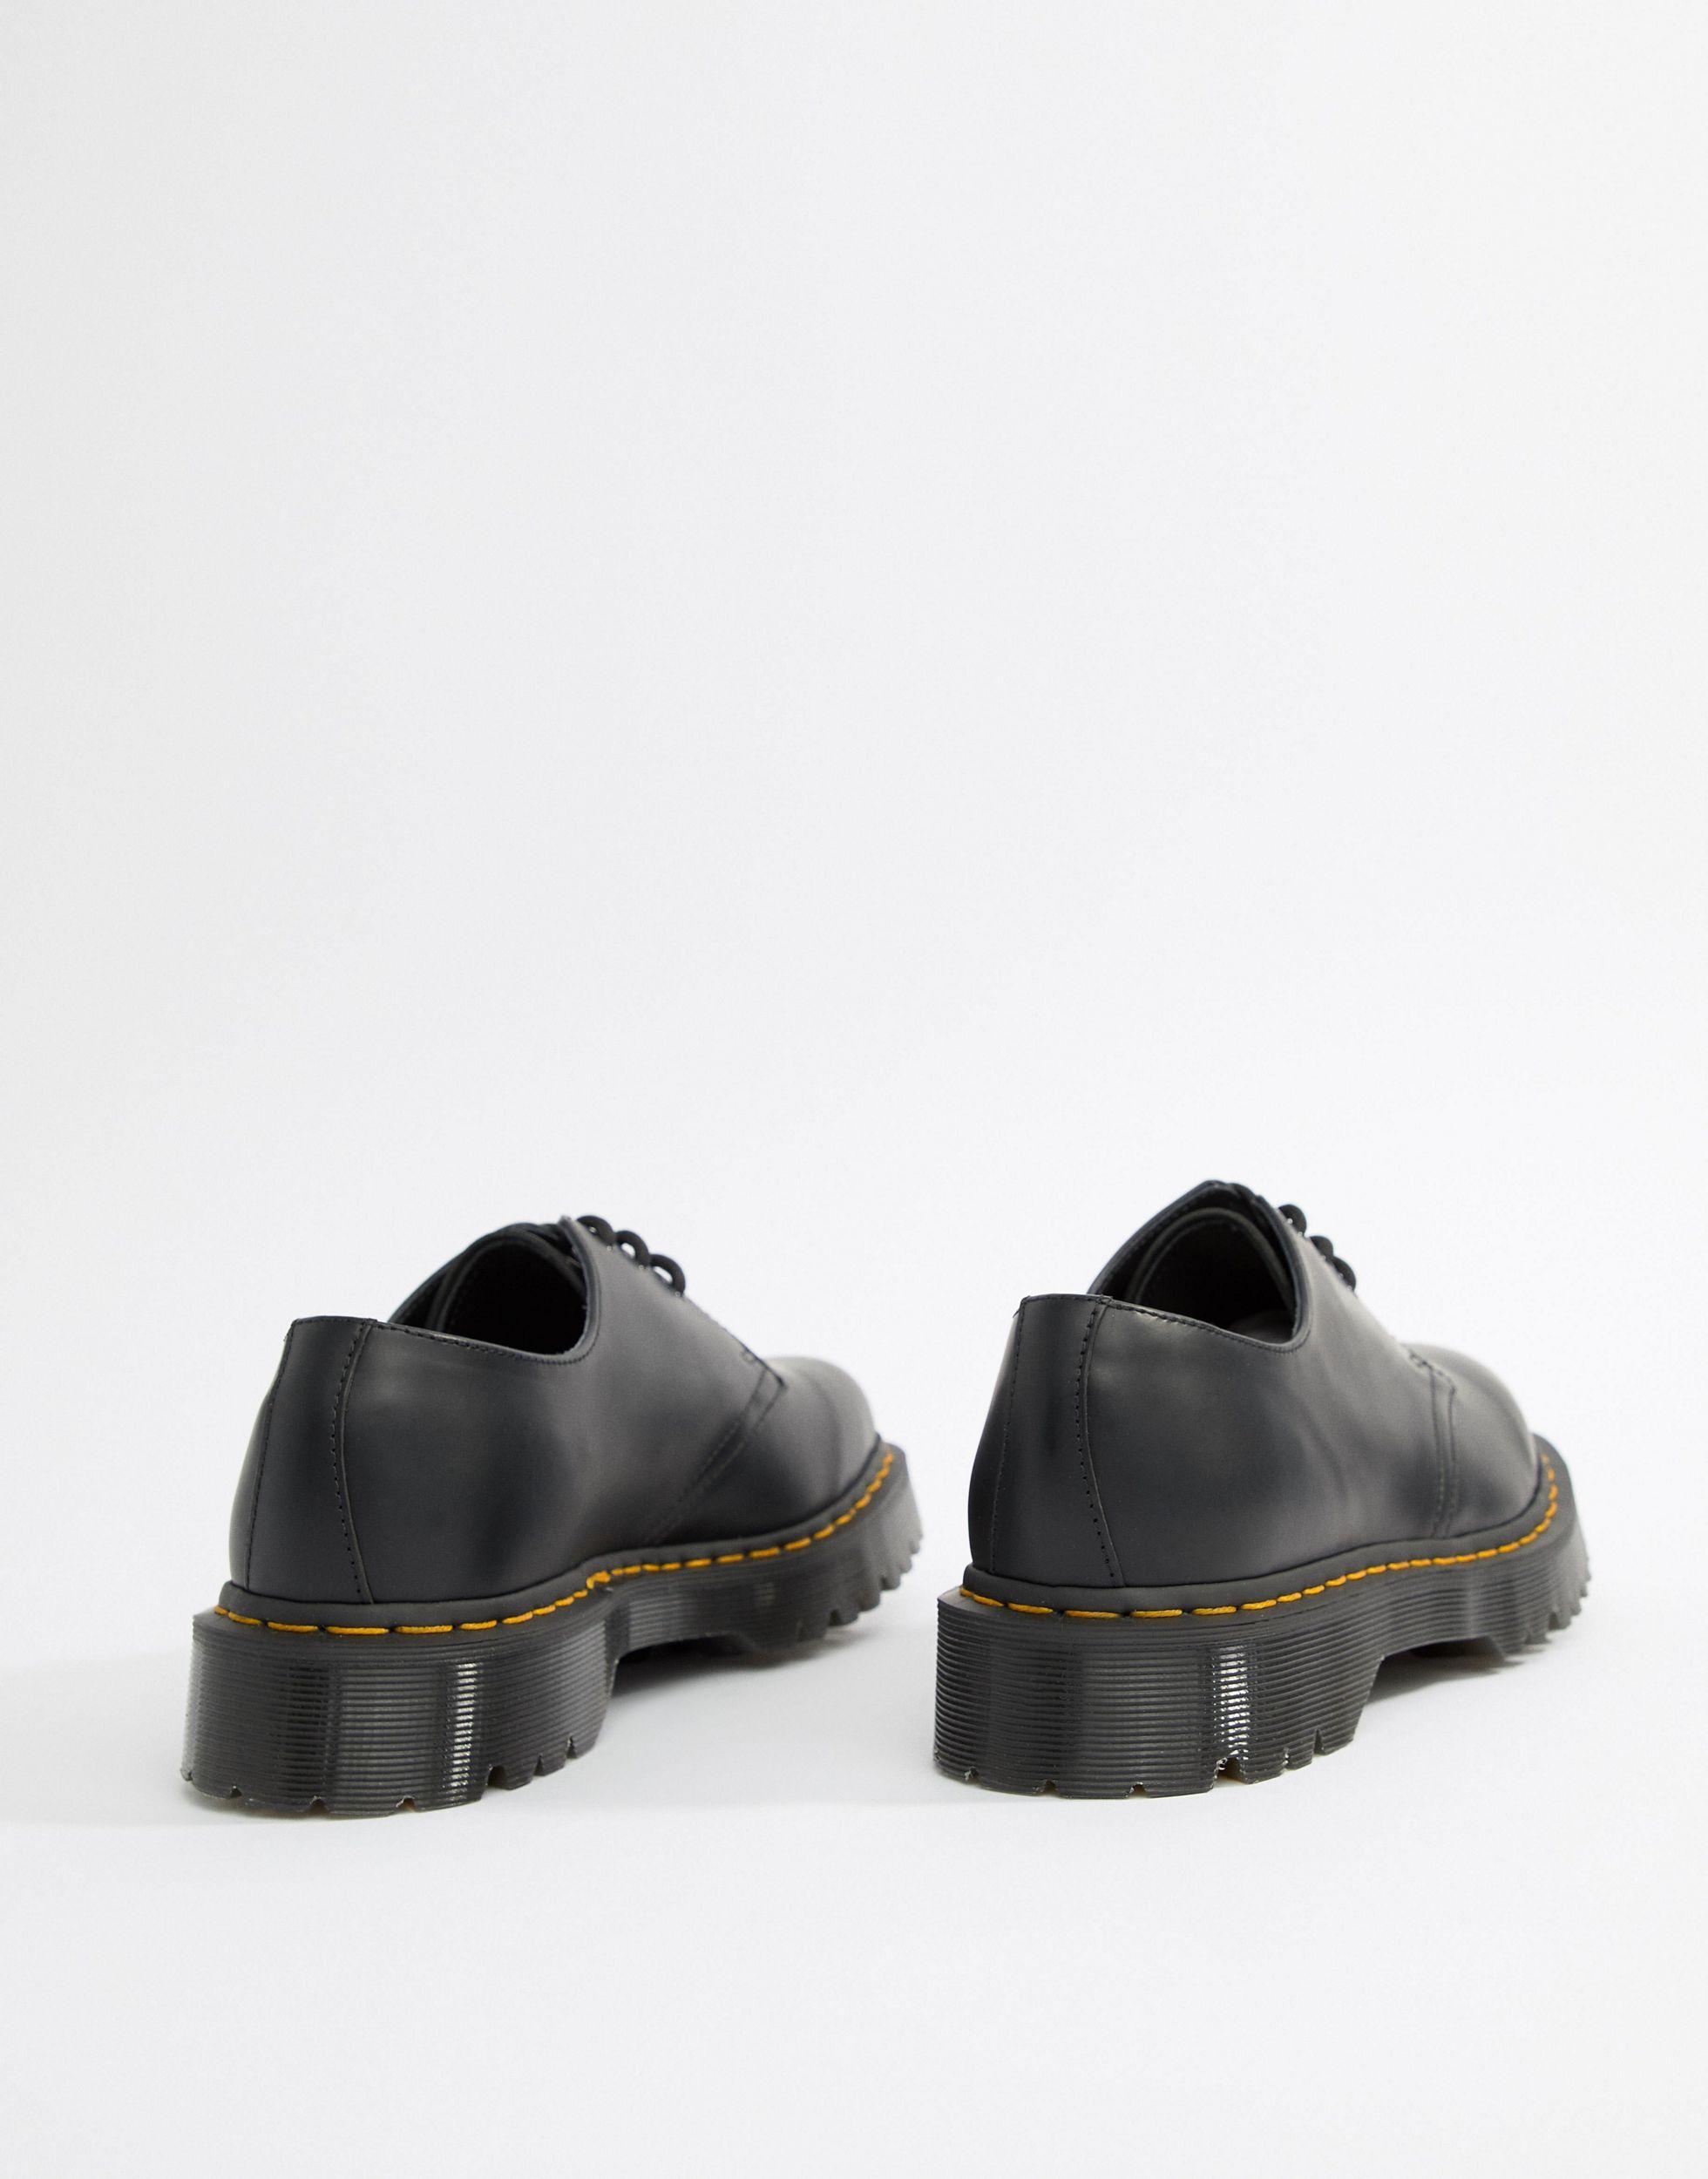 dr martens 1461 bex black factory 2486c